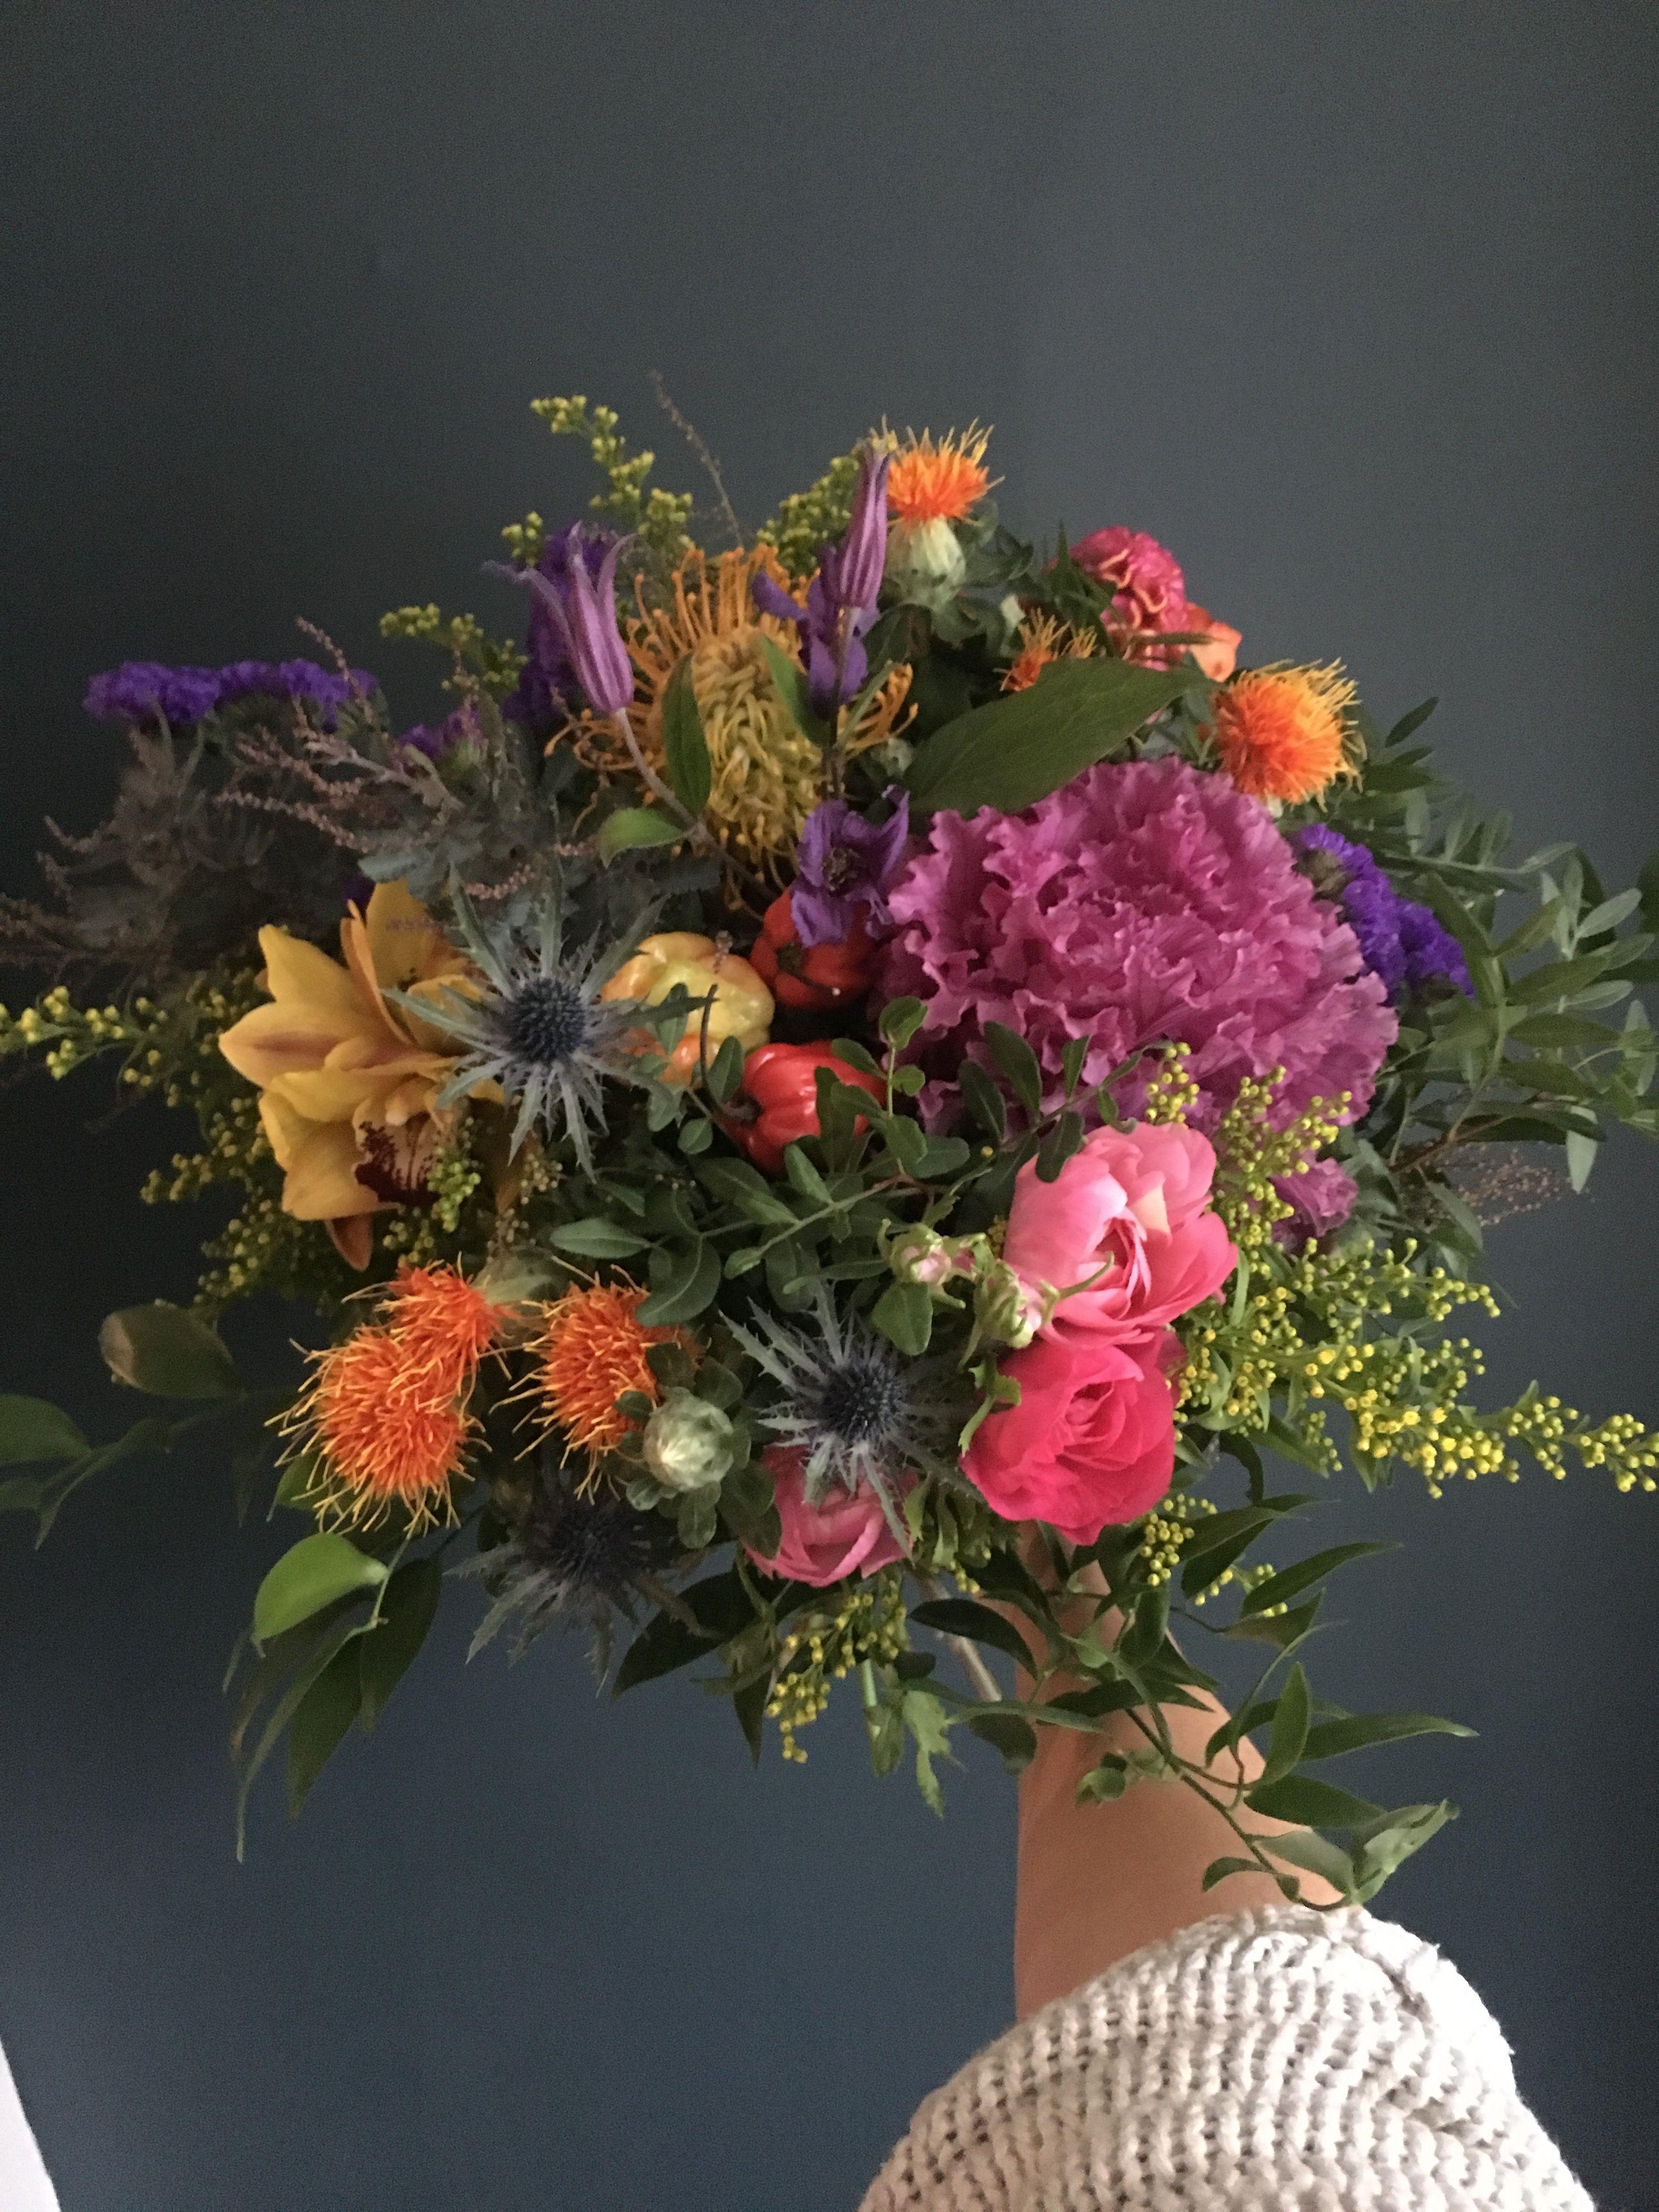 Pin by flourish flowers on flourish flowers in pinterest